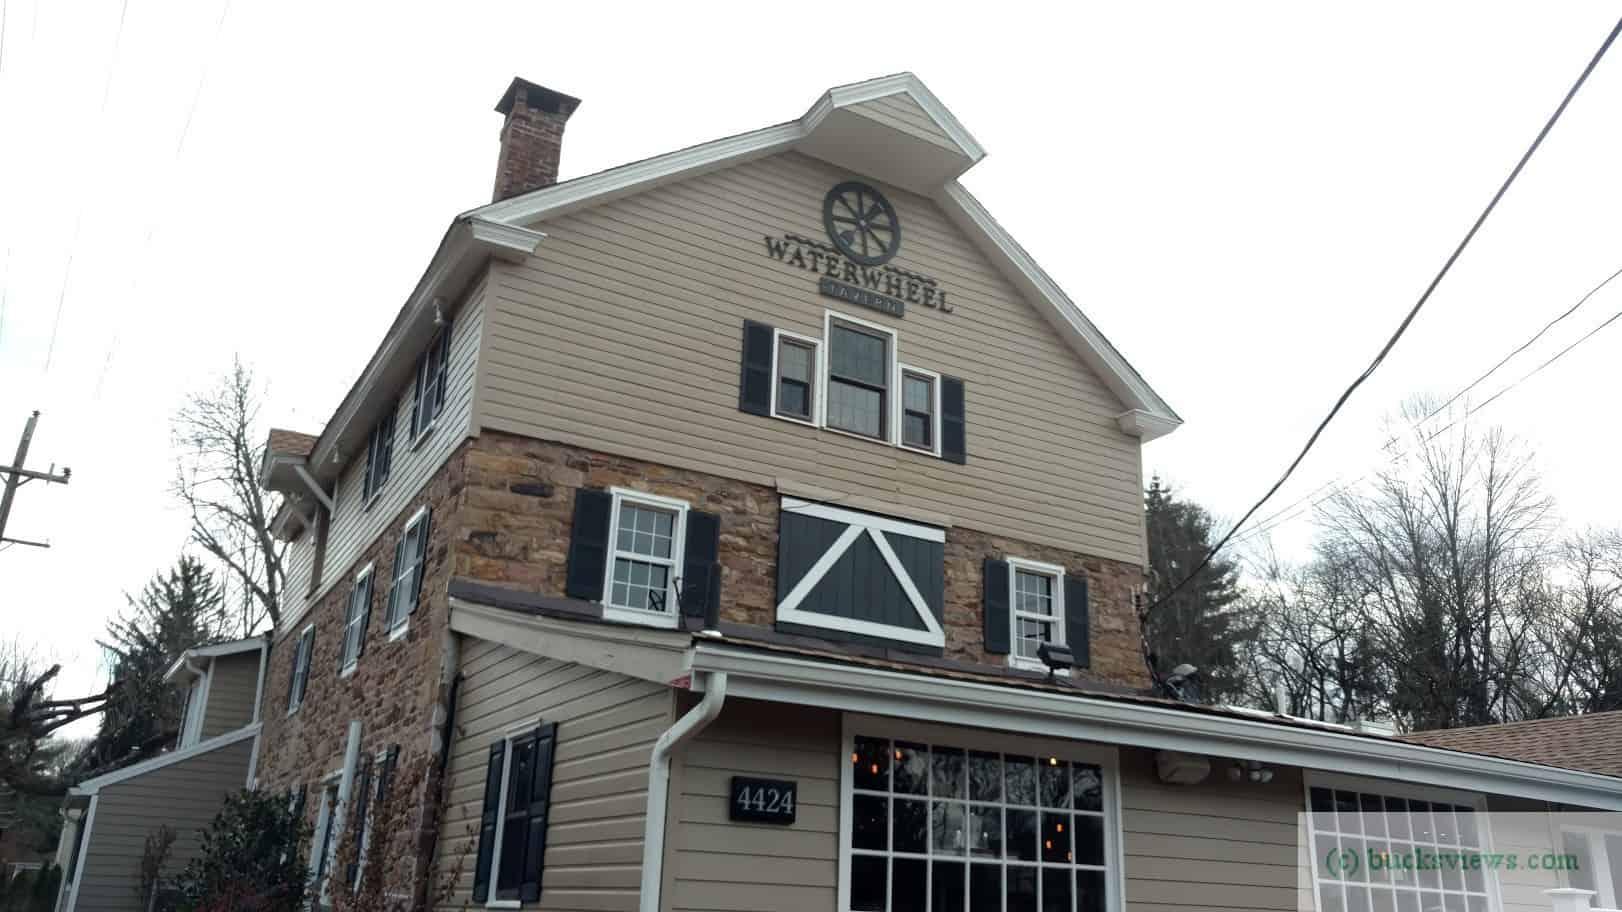 The Waterwheel Tavern in Doylestown